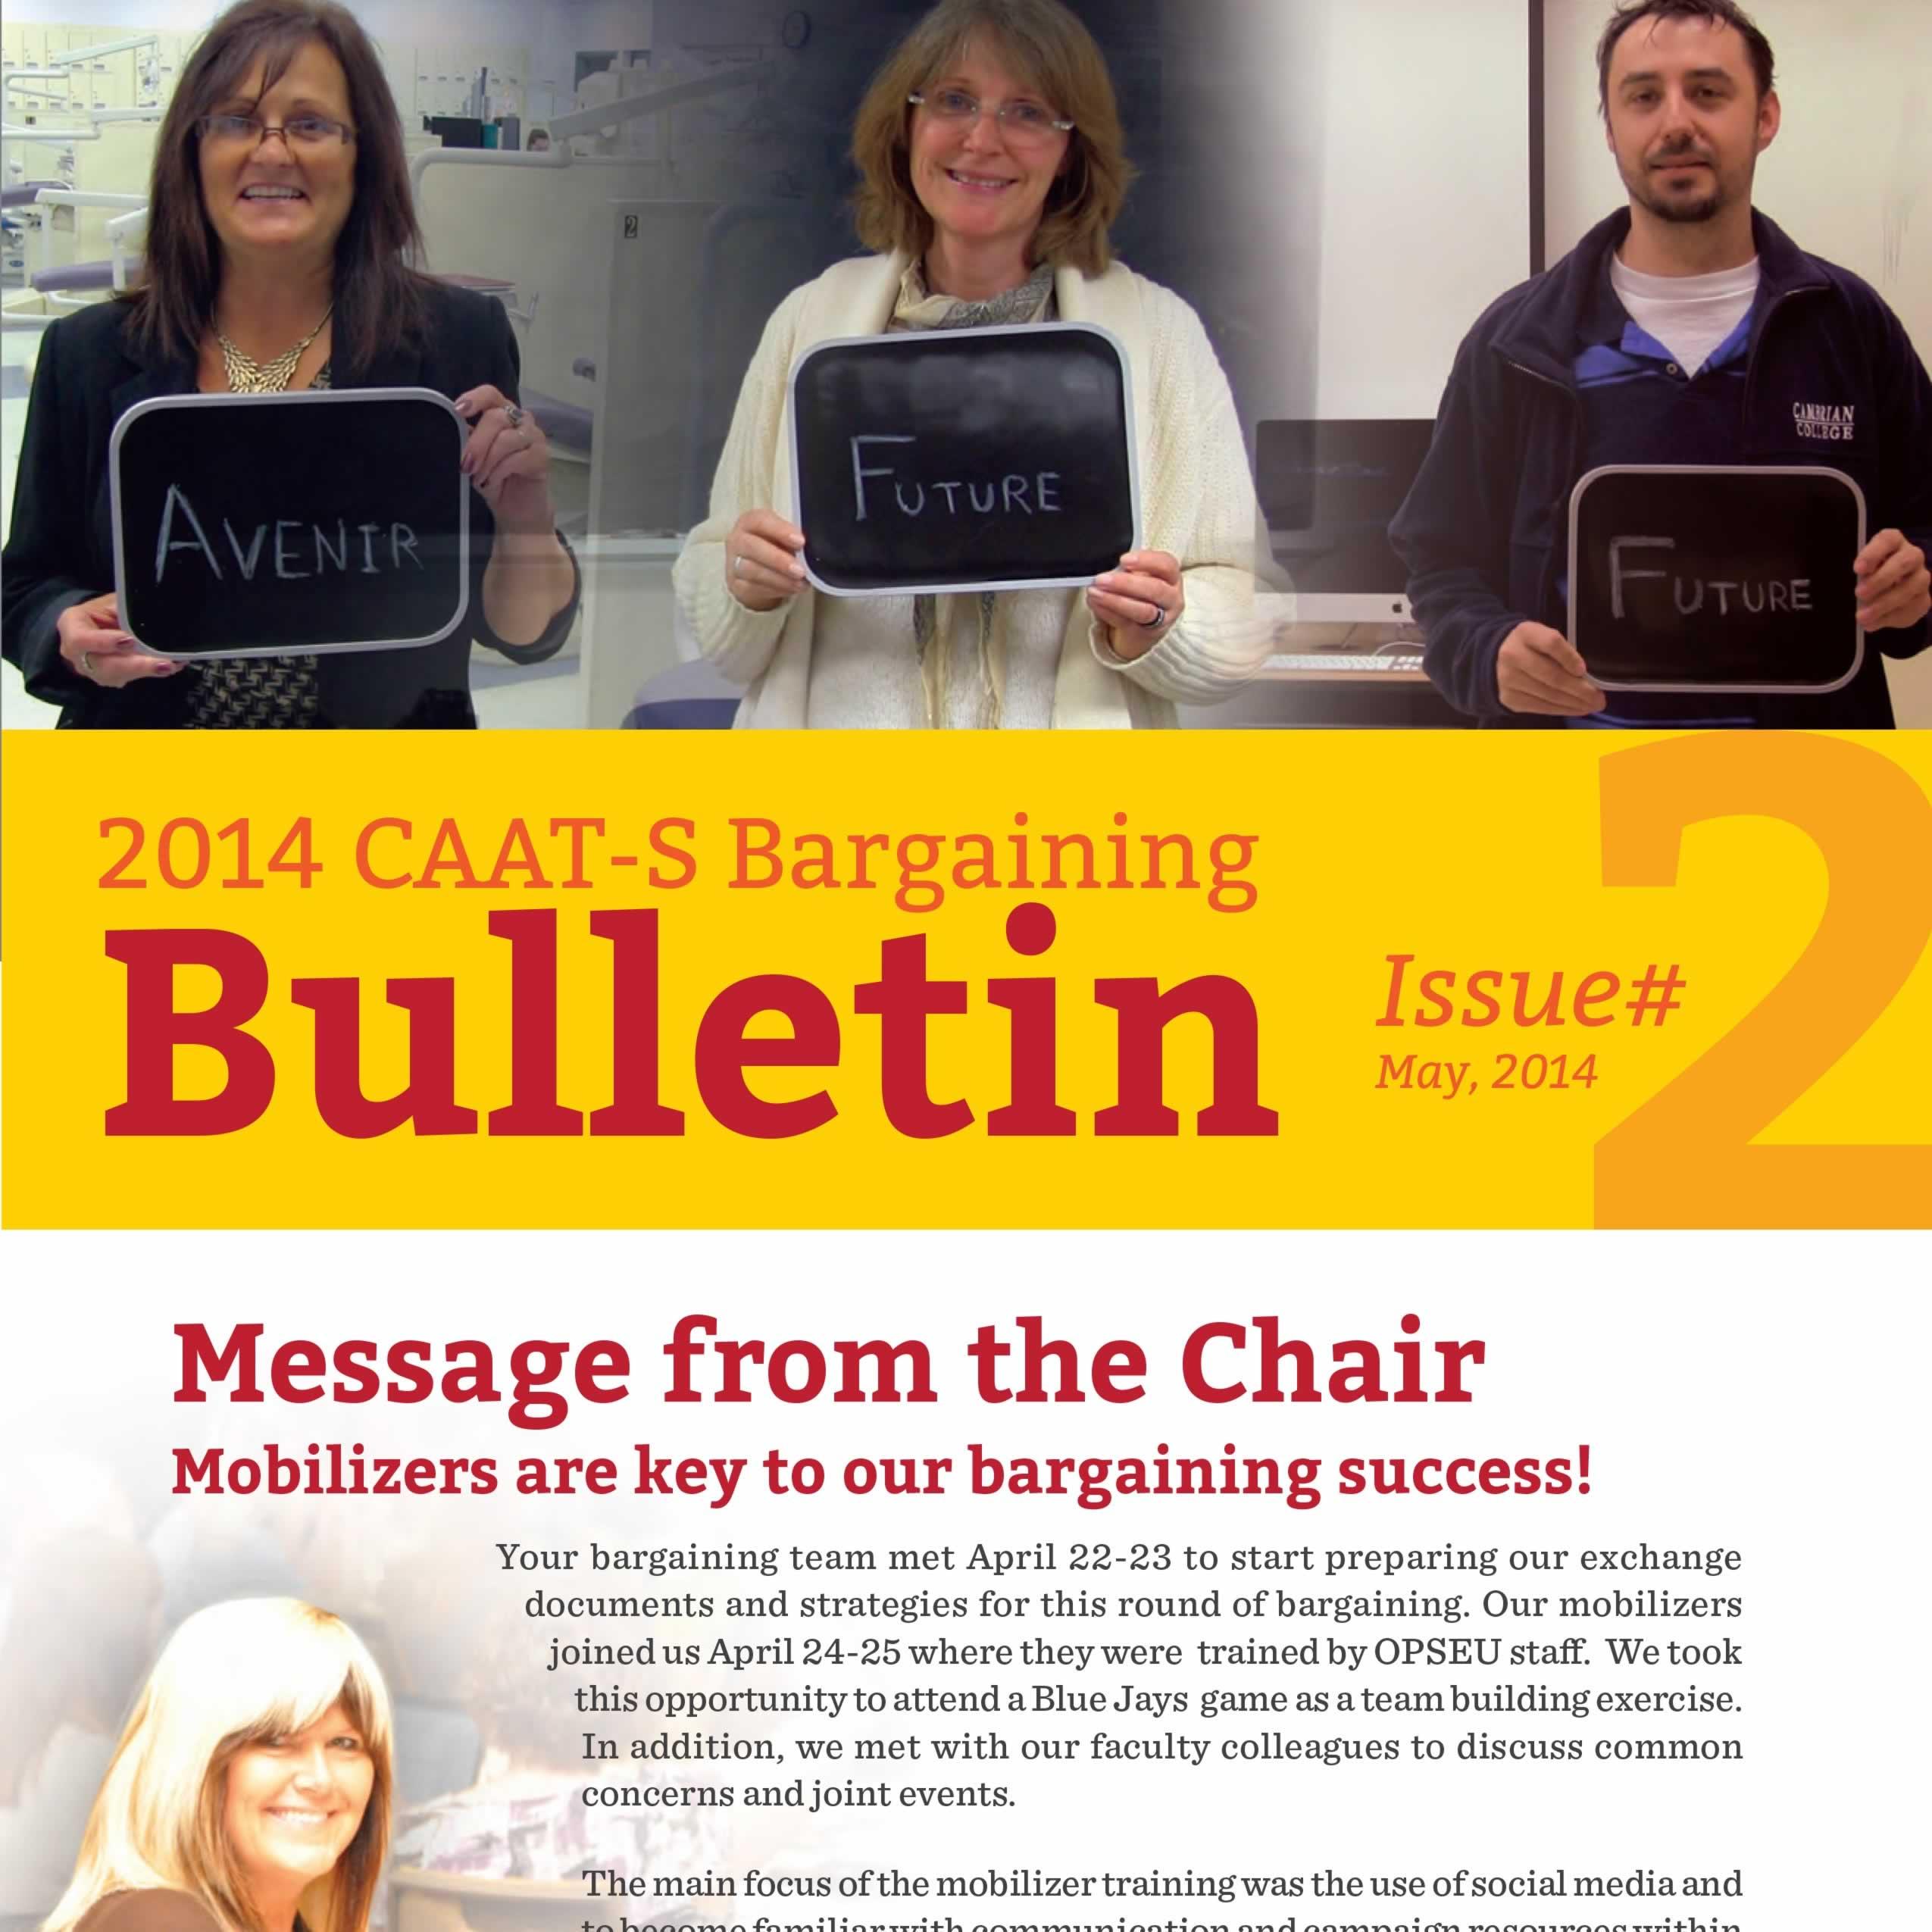 2014 CAAT-S Bargaining Bulletin Issue 2